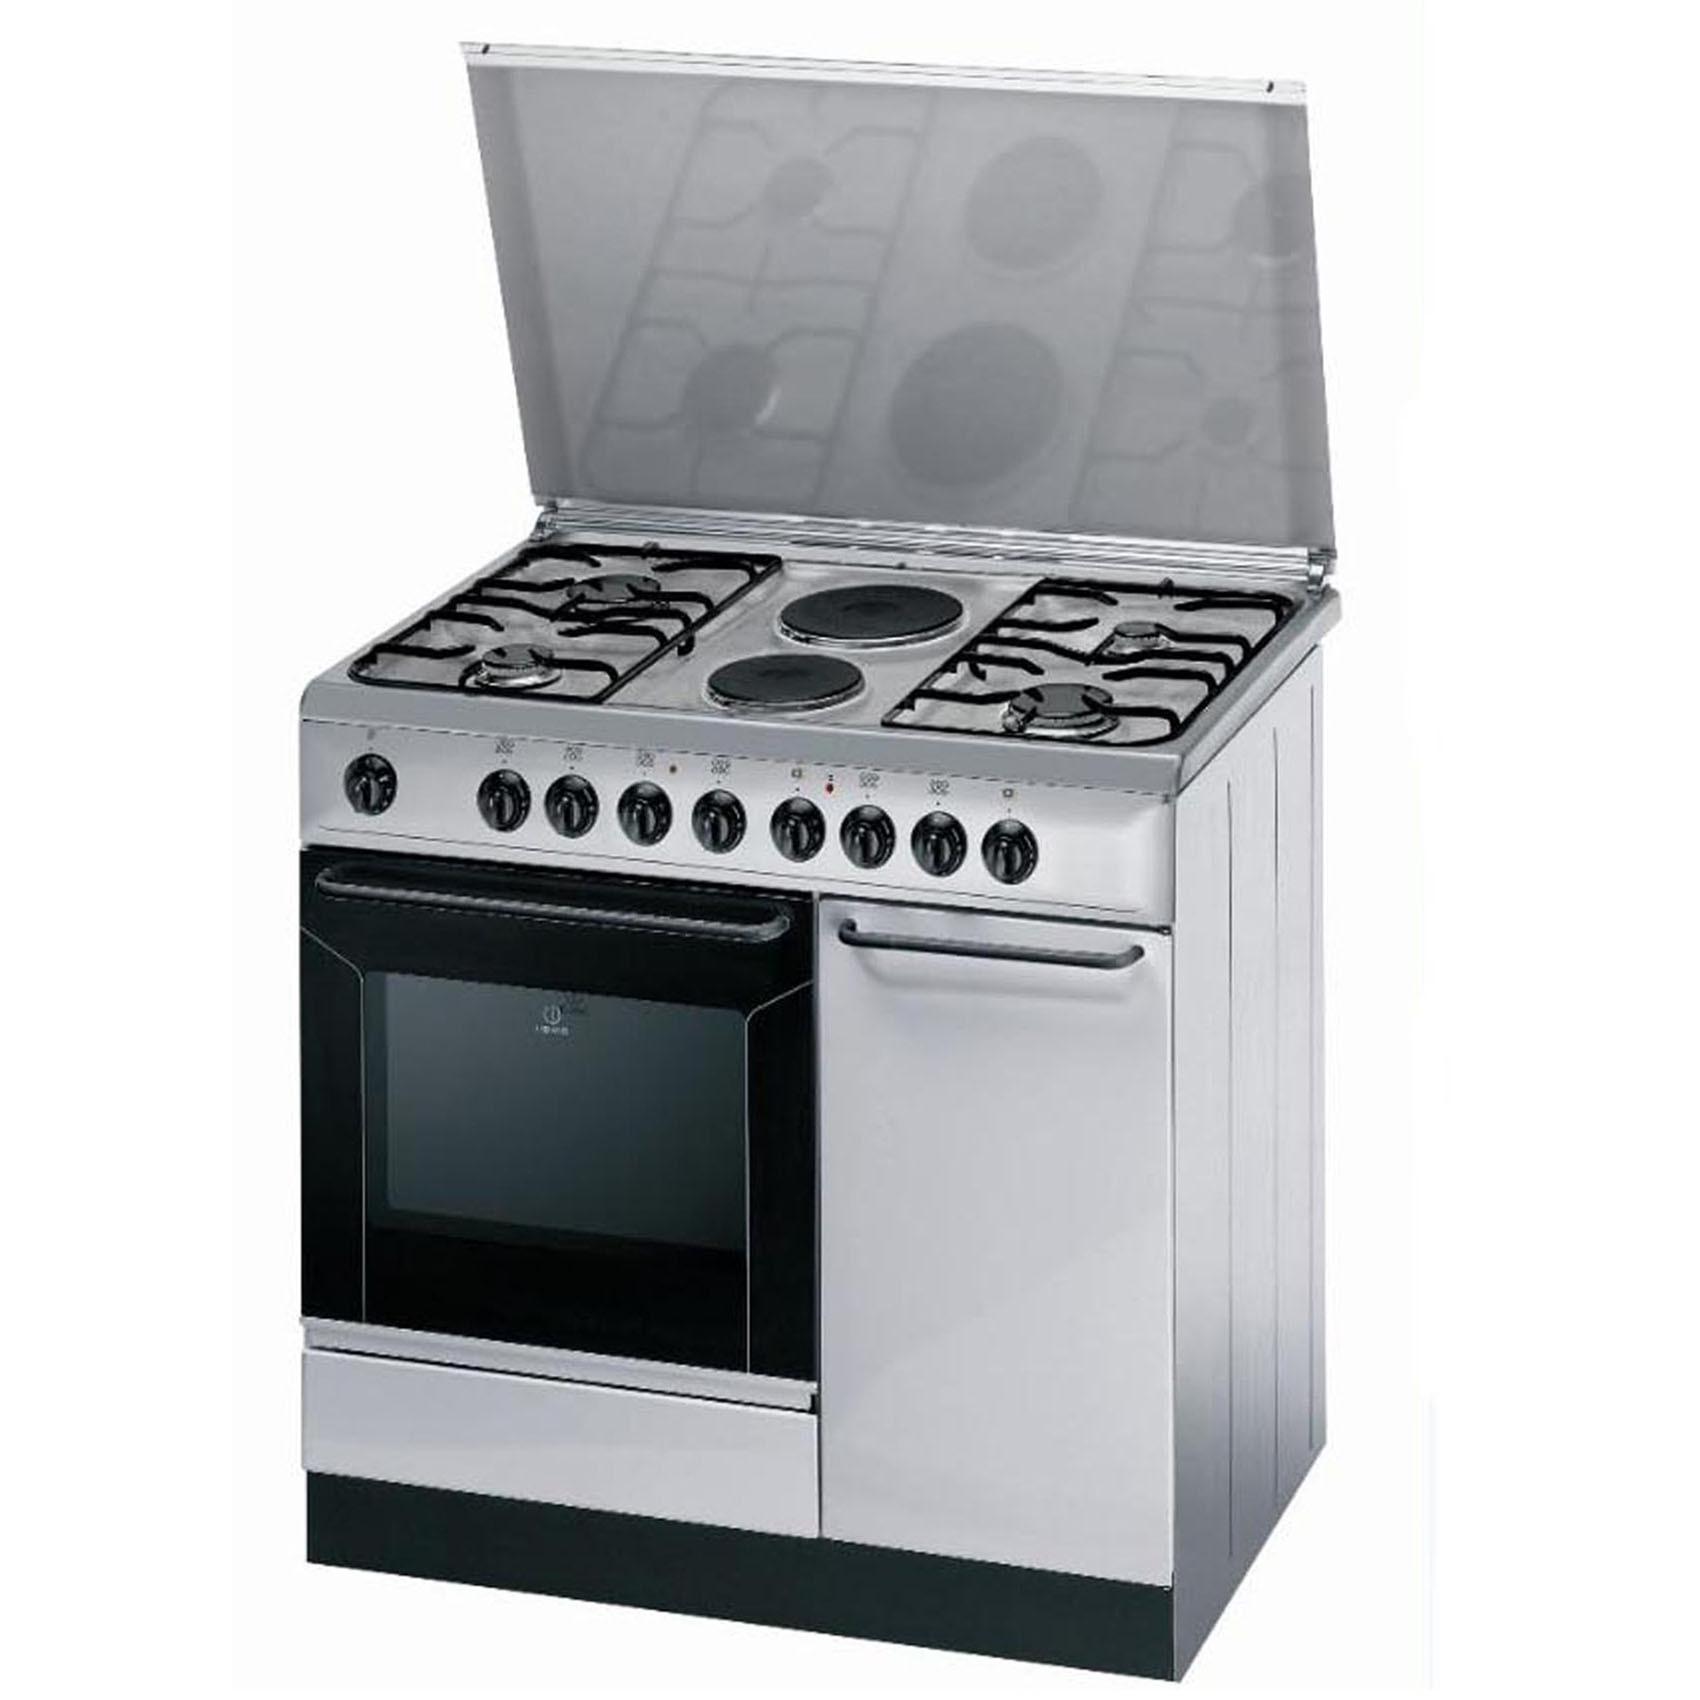 INDESIT COOKER K9B11SXI 90X60CM